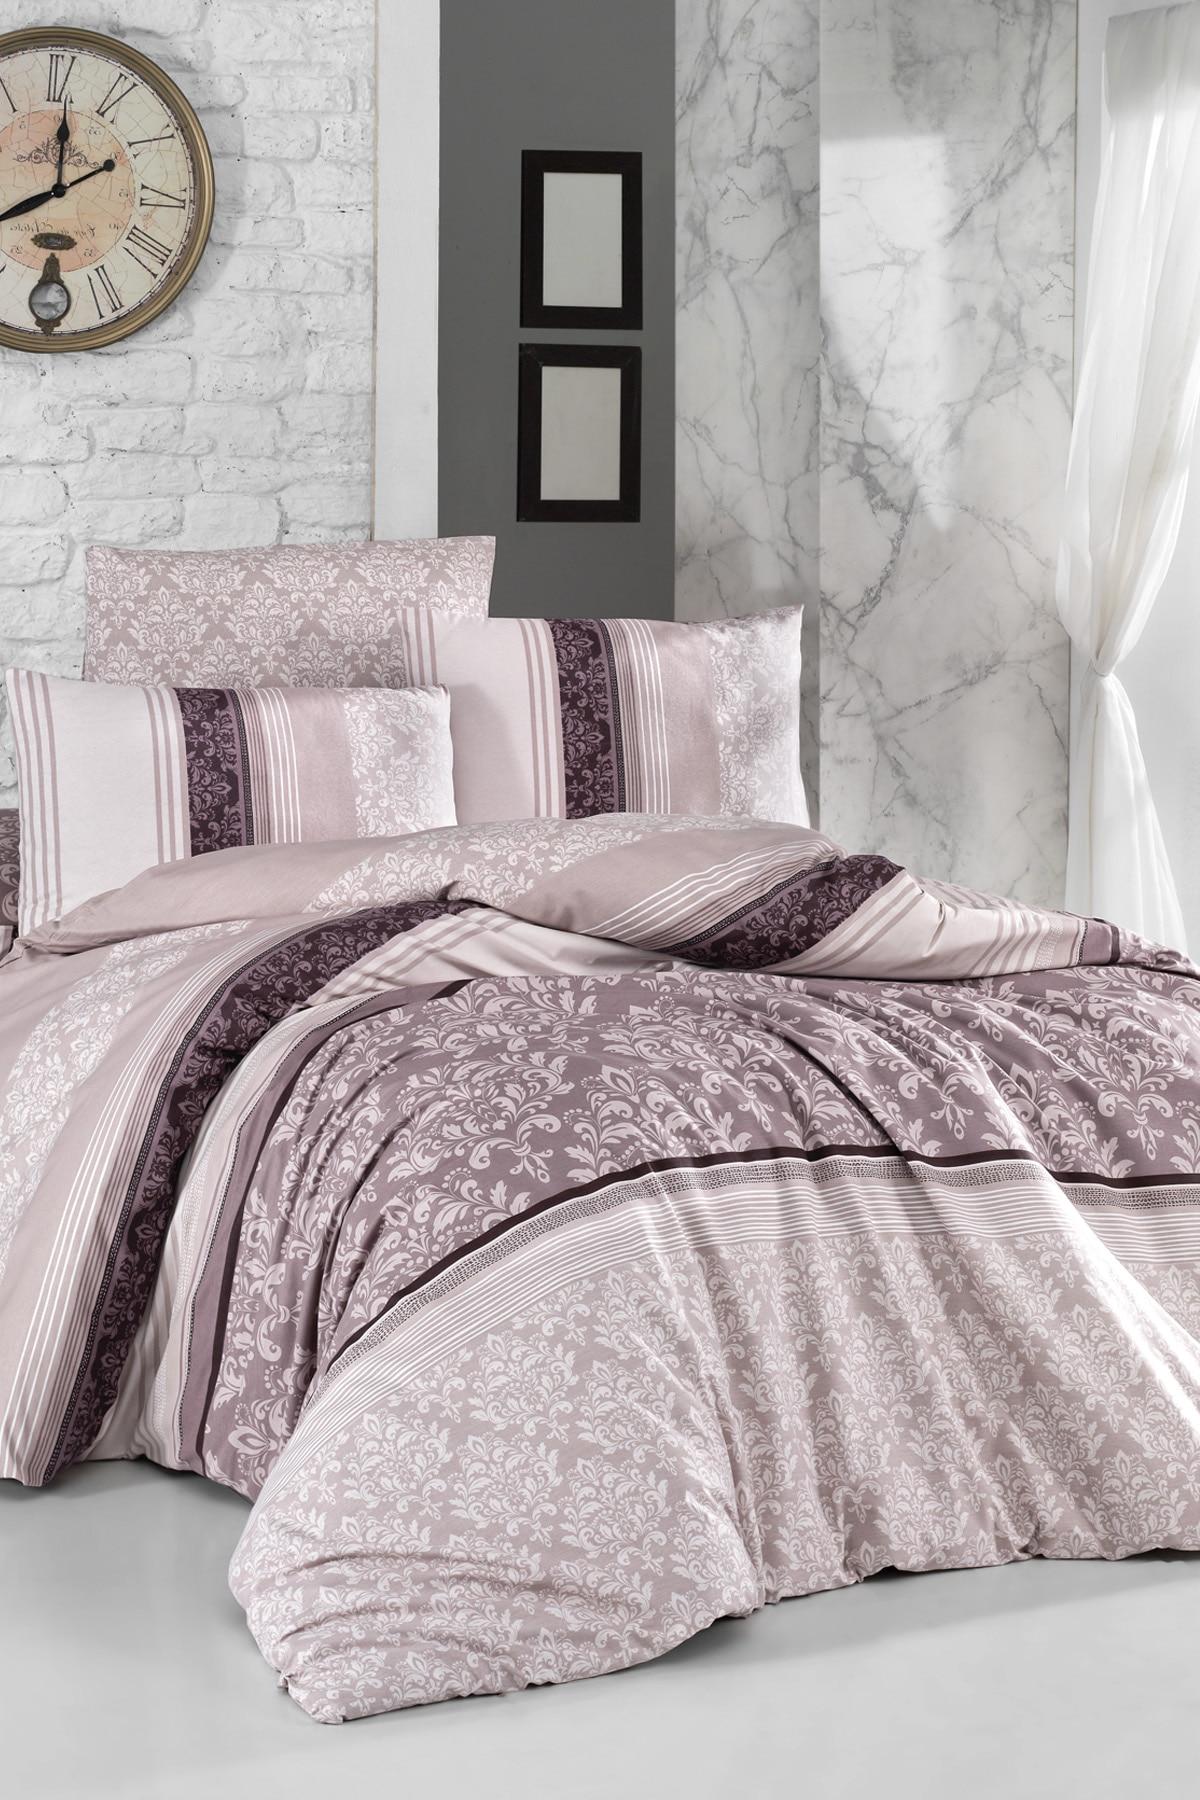 Lady Moda Bed Linen Set Aura Luxury Ranforce Bedding Set Twin/Full/Queen/King Size 3/4/5 Pcs Duvet Cover Set From Turkey